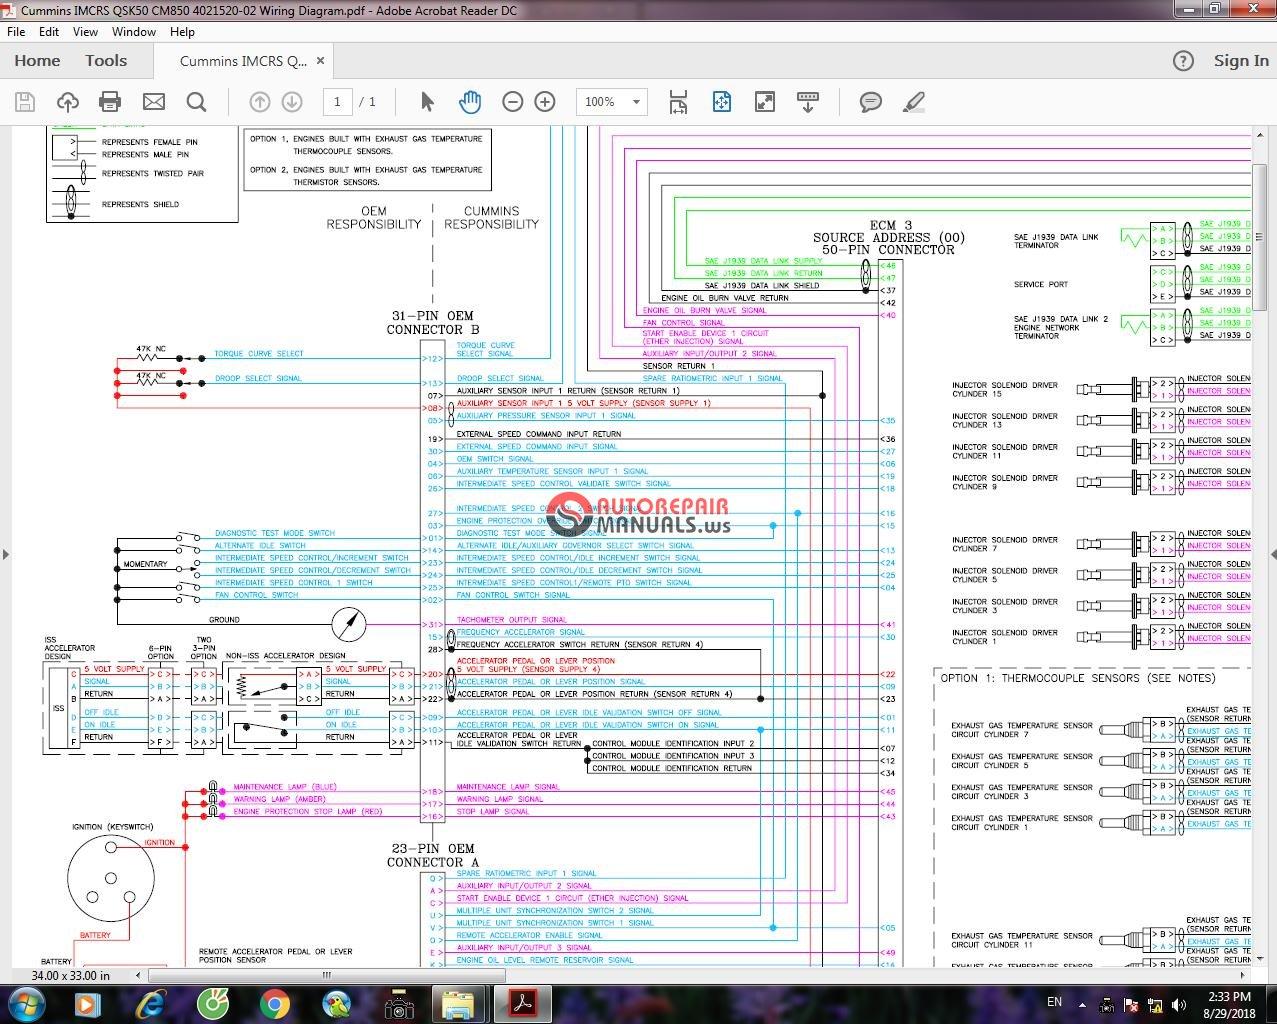 Cummins IMCRS QSK50 CM850 4021520-02 Wiring Diagram 1.jpg ...